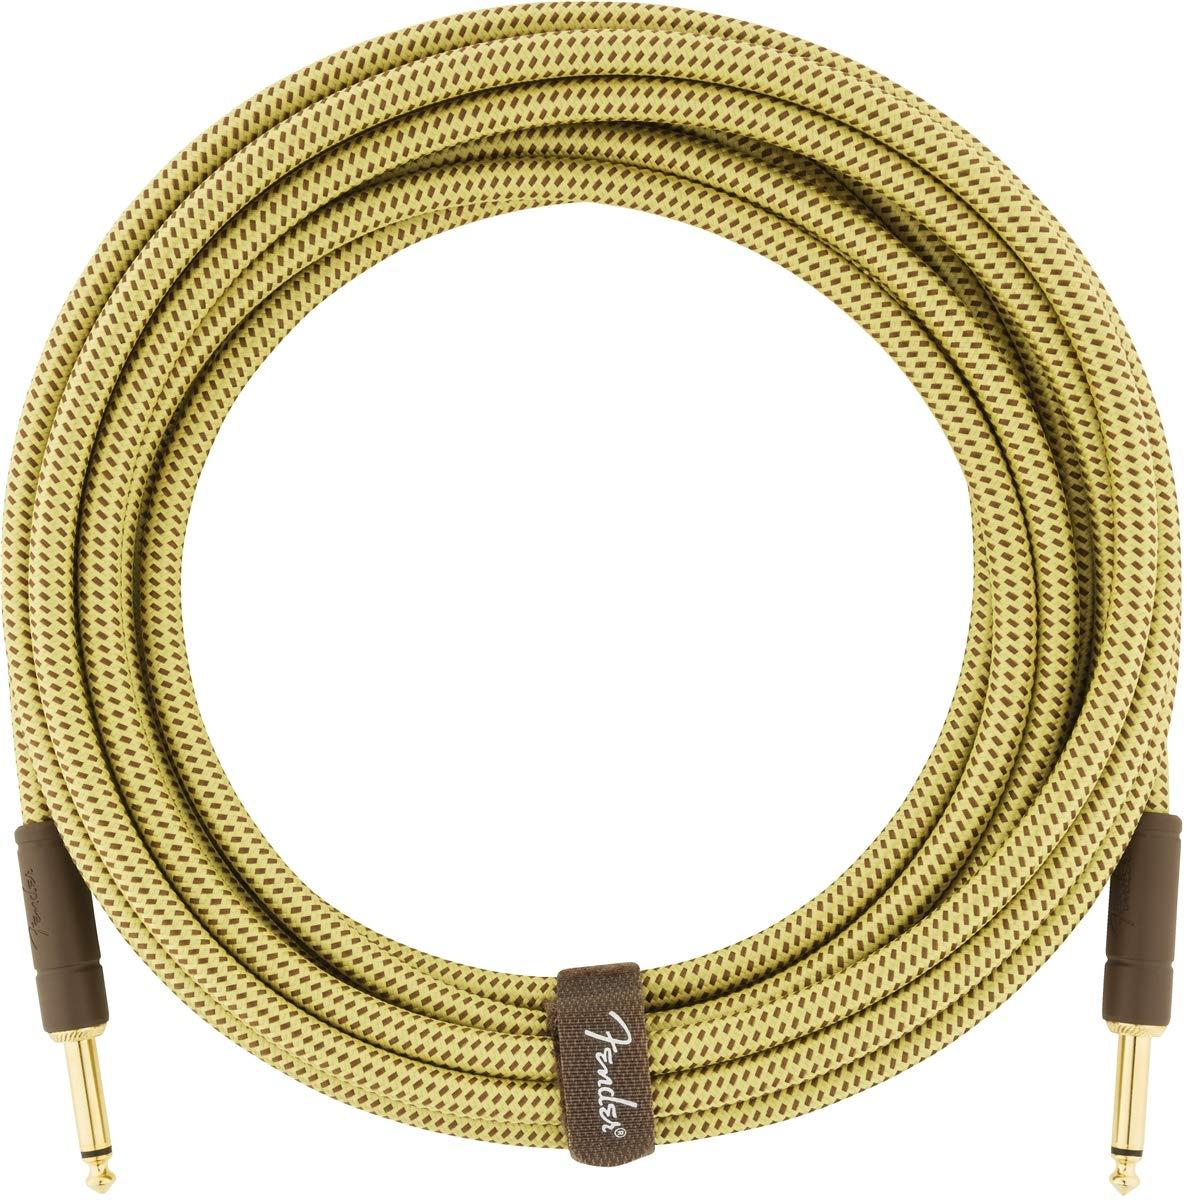 Fender Deluxe Series Cable de antena 5,5 m